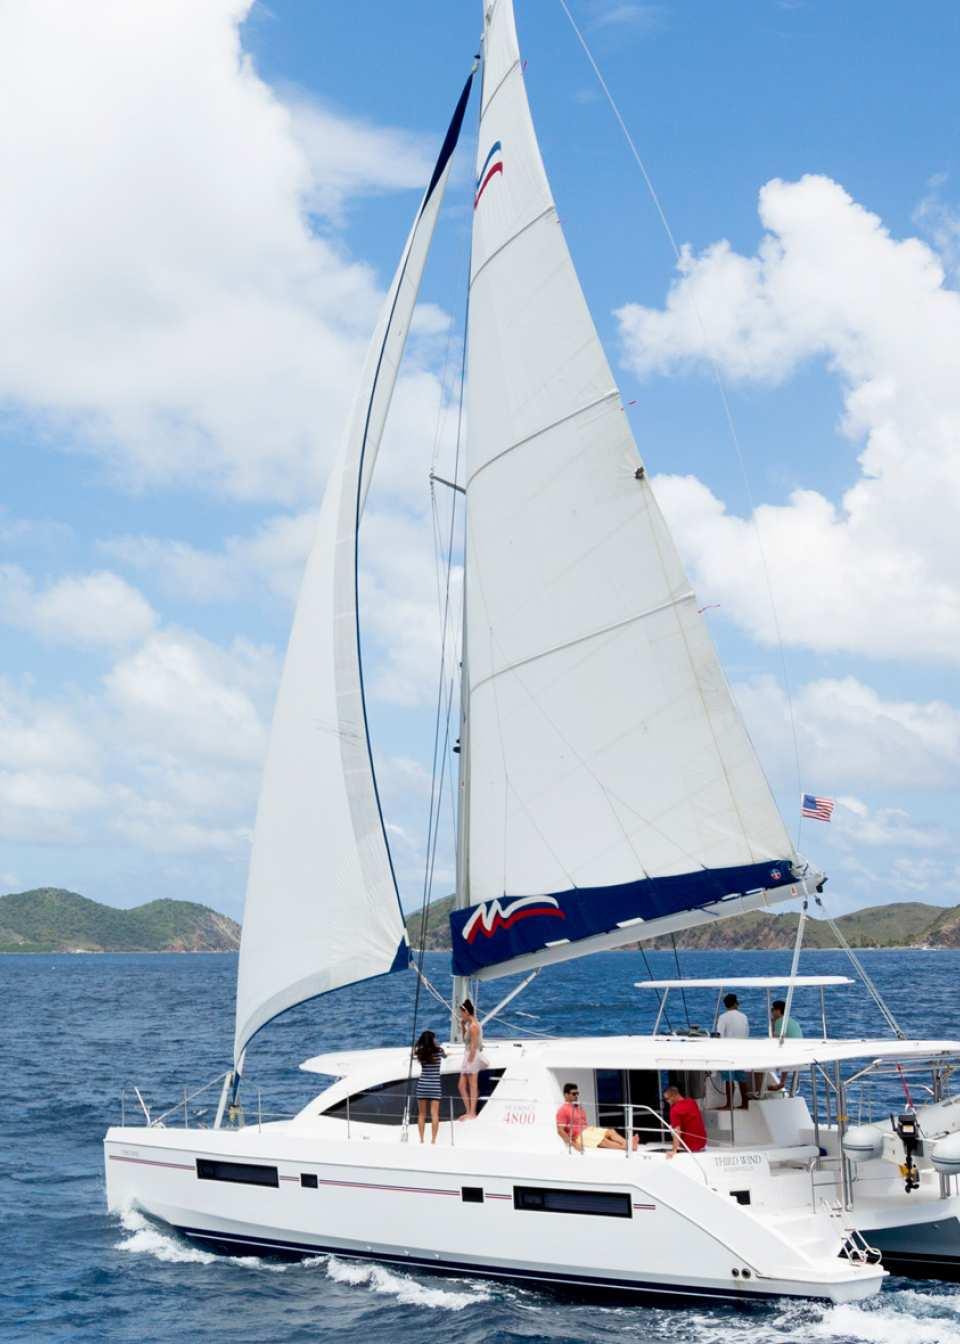 sailing online dating Free-to-play sailing simulator, sailing game and social network.